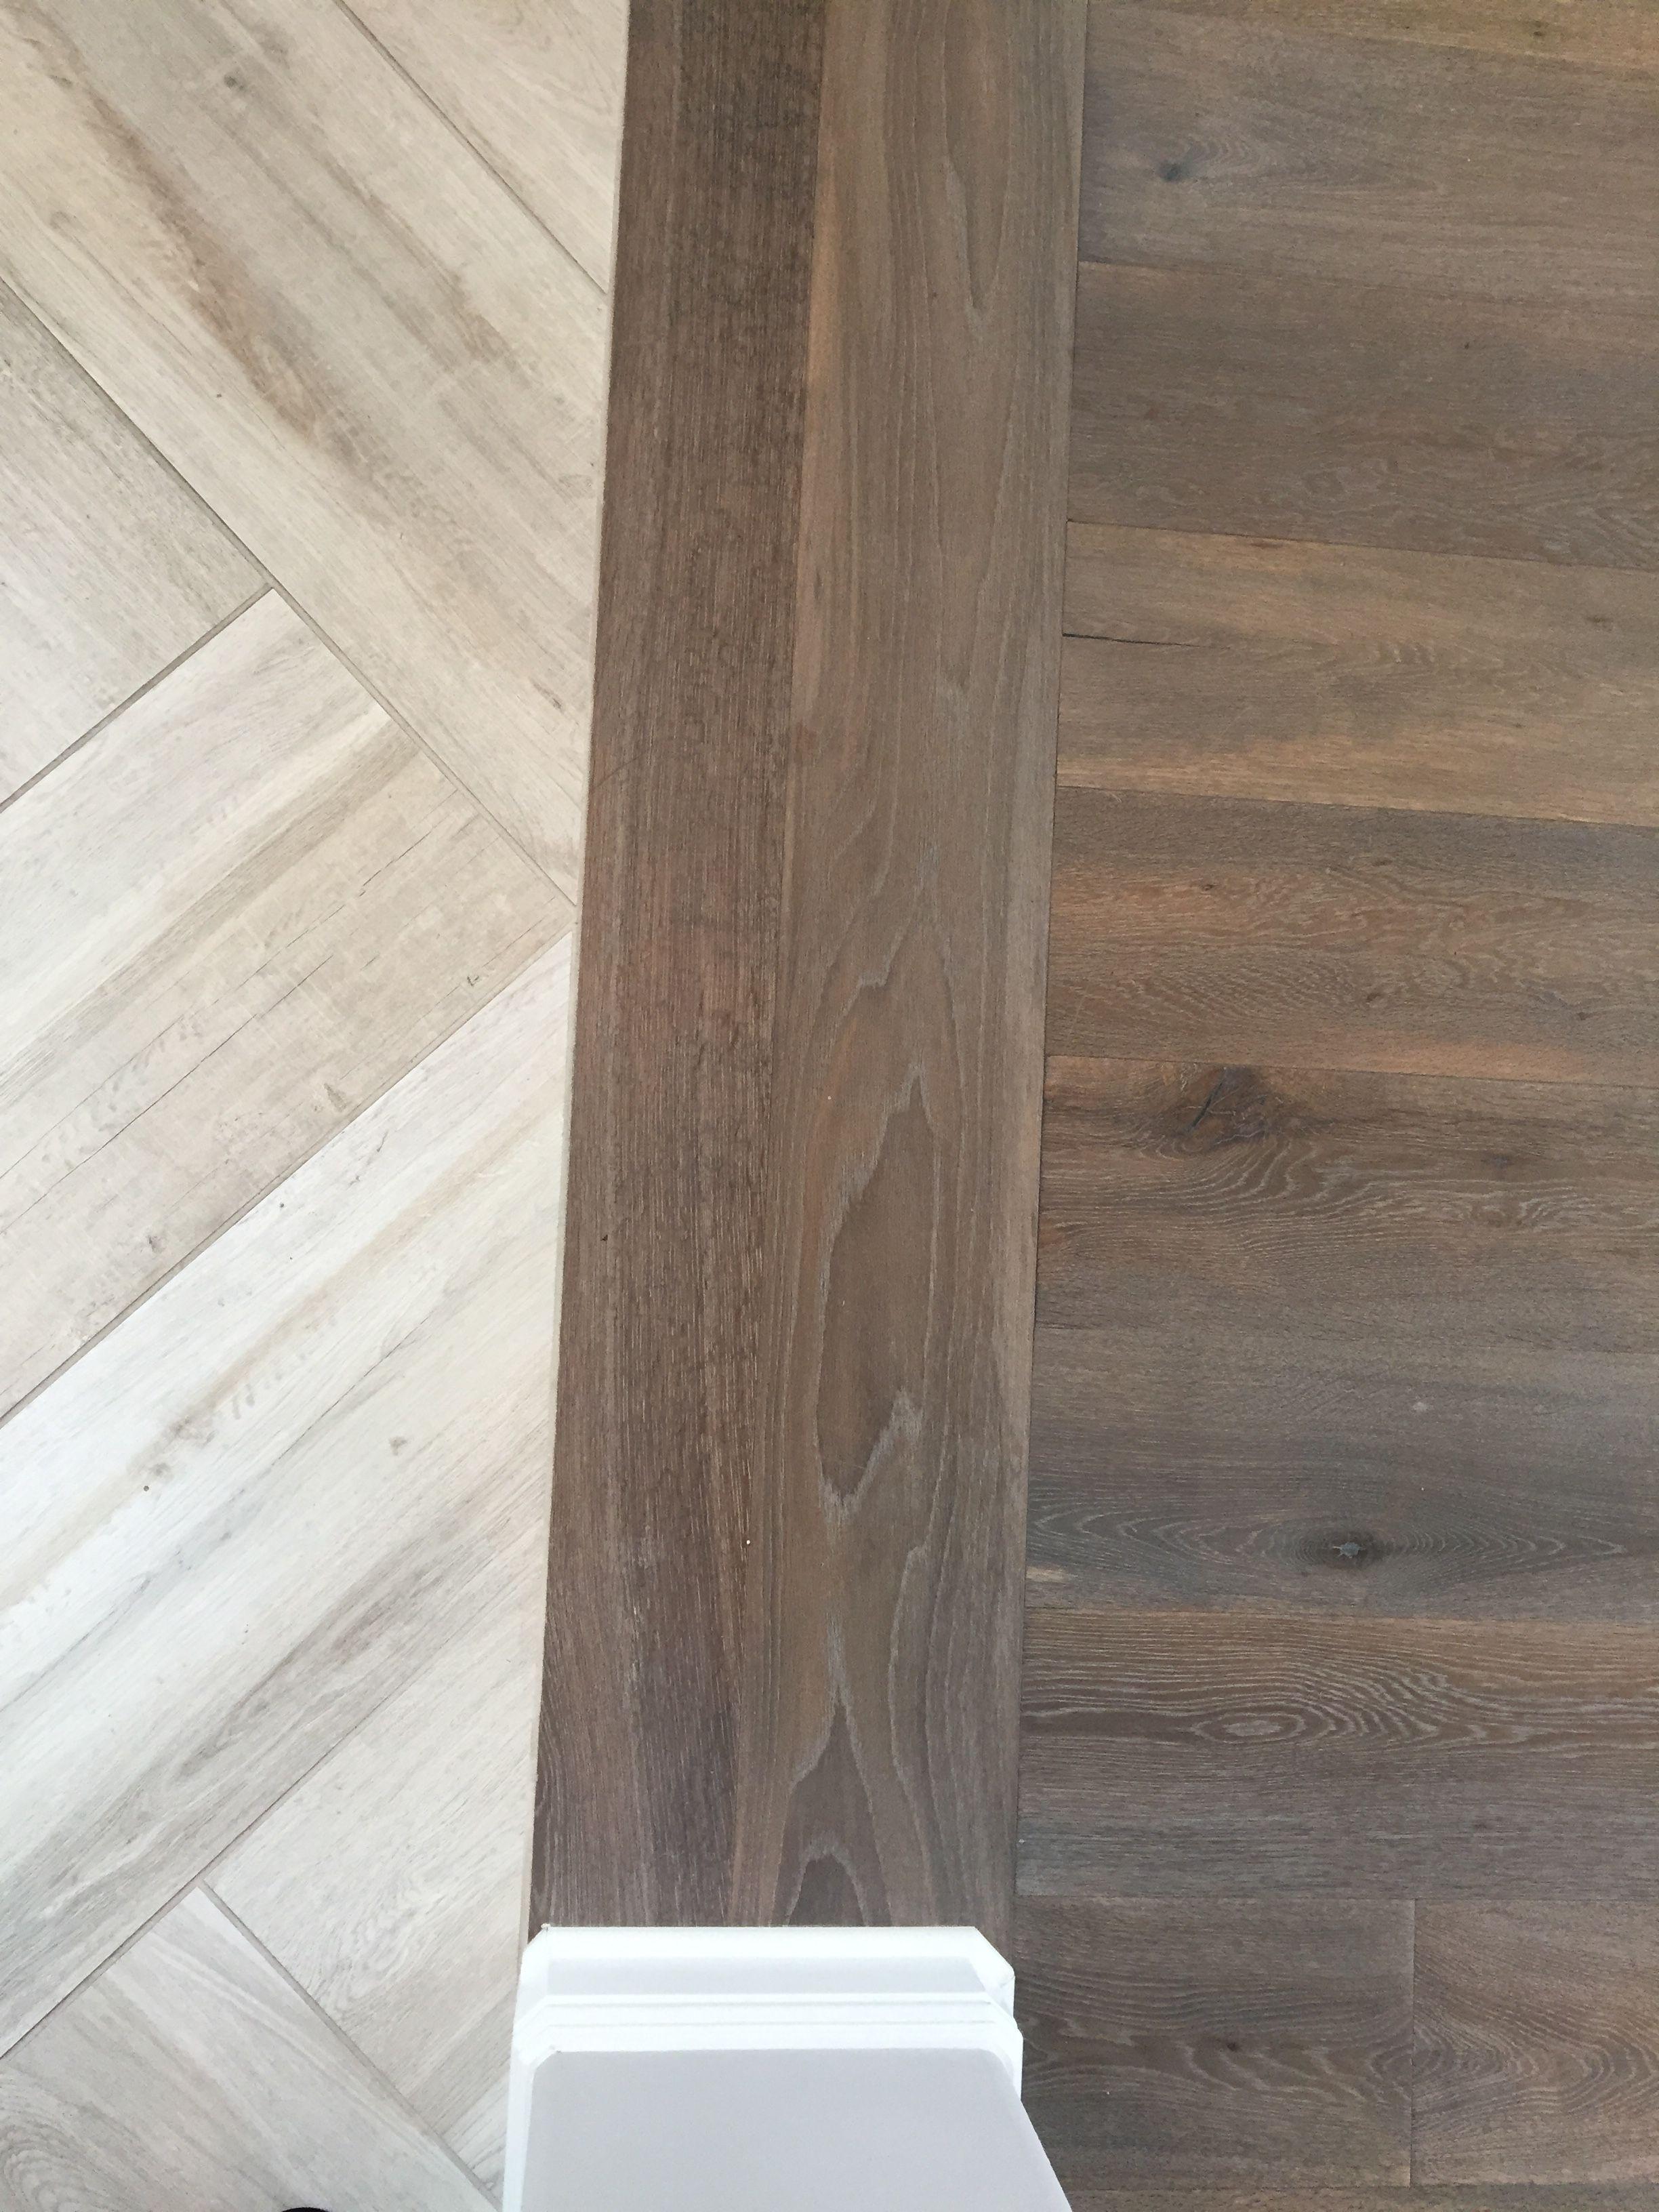 20 Fashionable Hardwood Floor Refinishing Little Rock 2021 free download hardwood floor refinishing little rock of floor transition laminate to herringbone tile pattern model pertaining to floor transition laminate to herringbone tile pattern